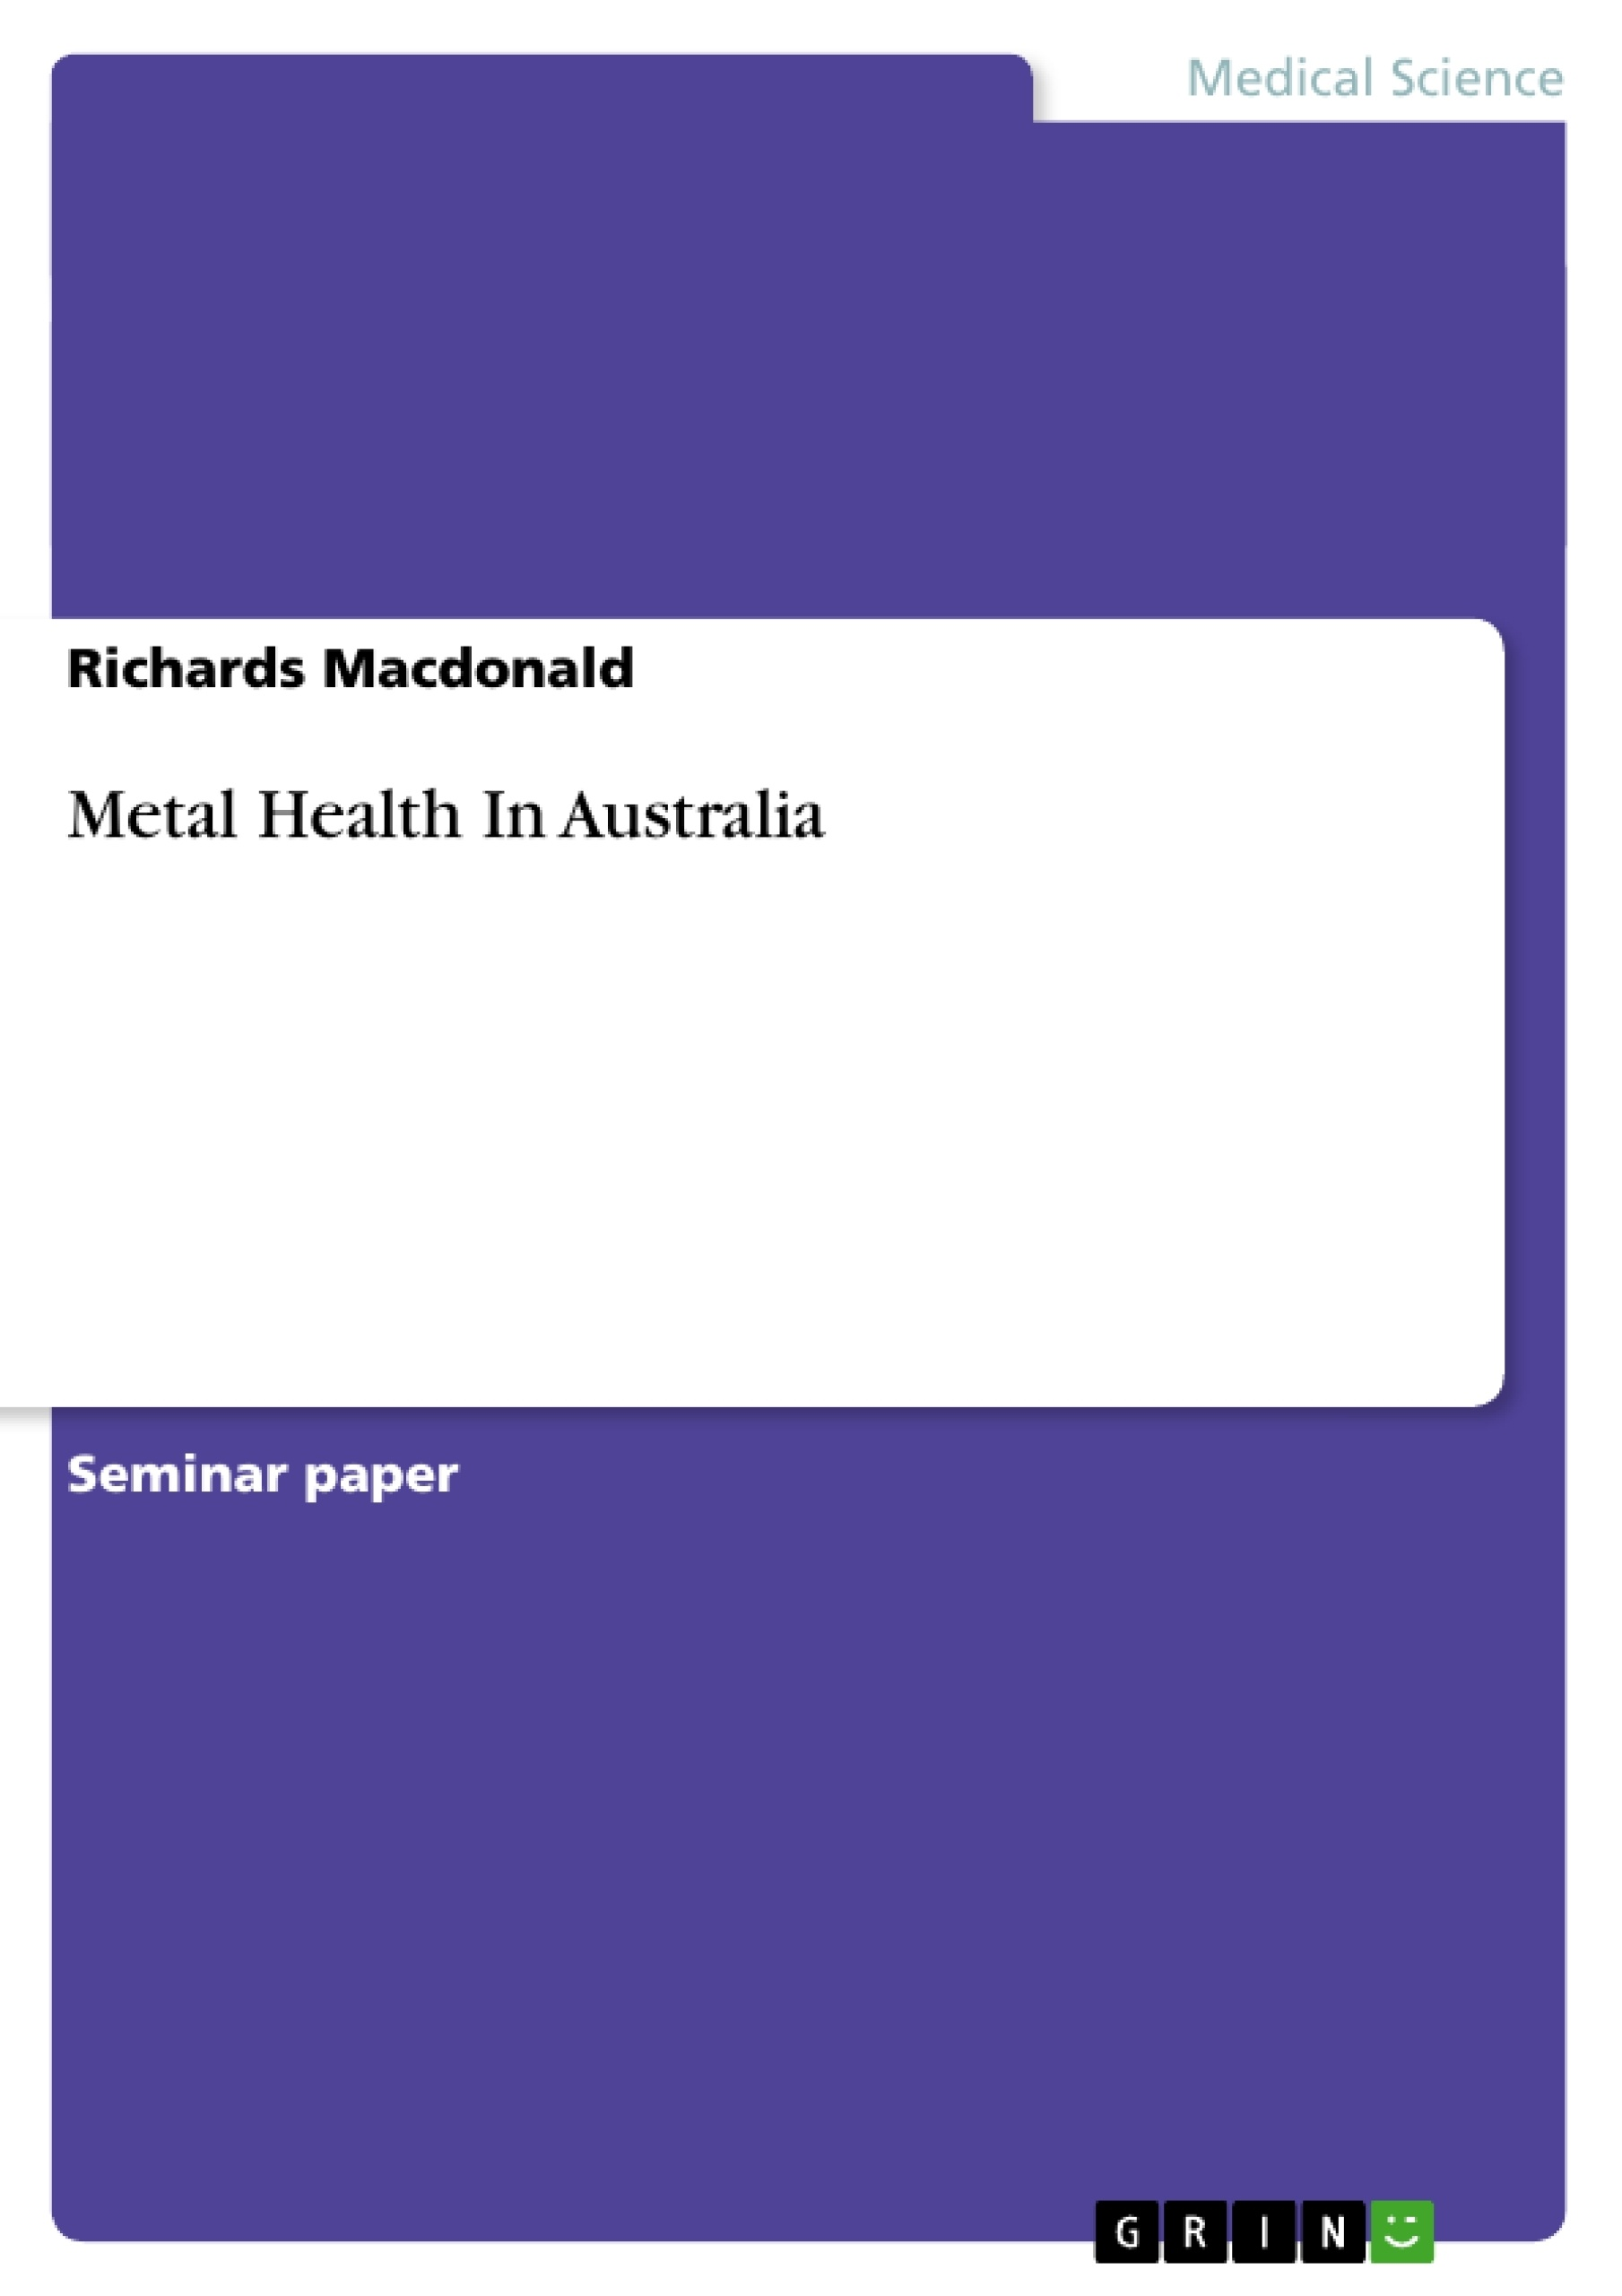 Title: Metal Health In Australia